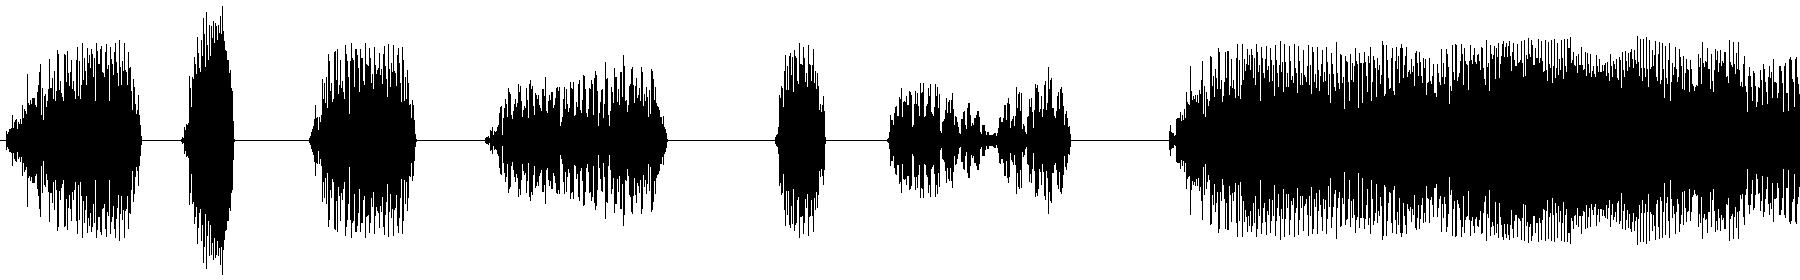 96 scratch loop 03